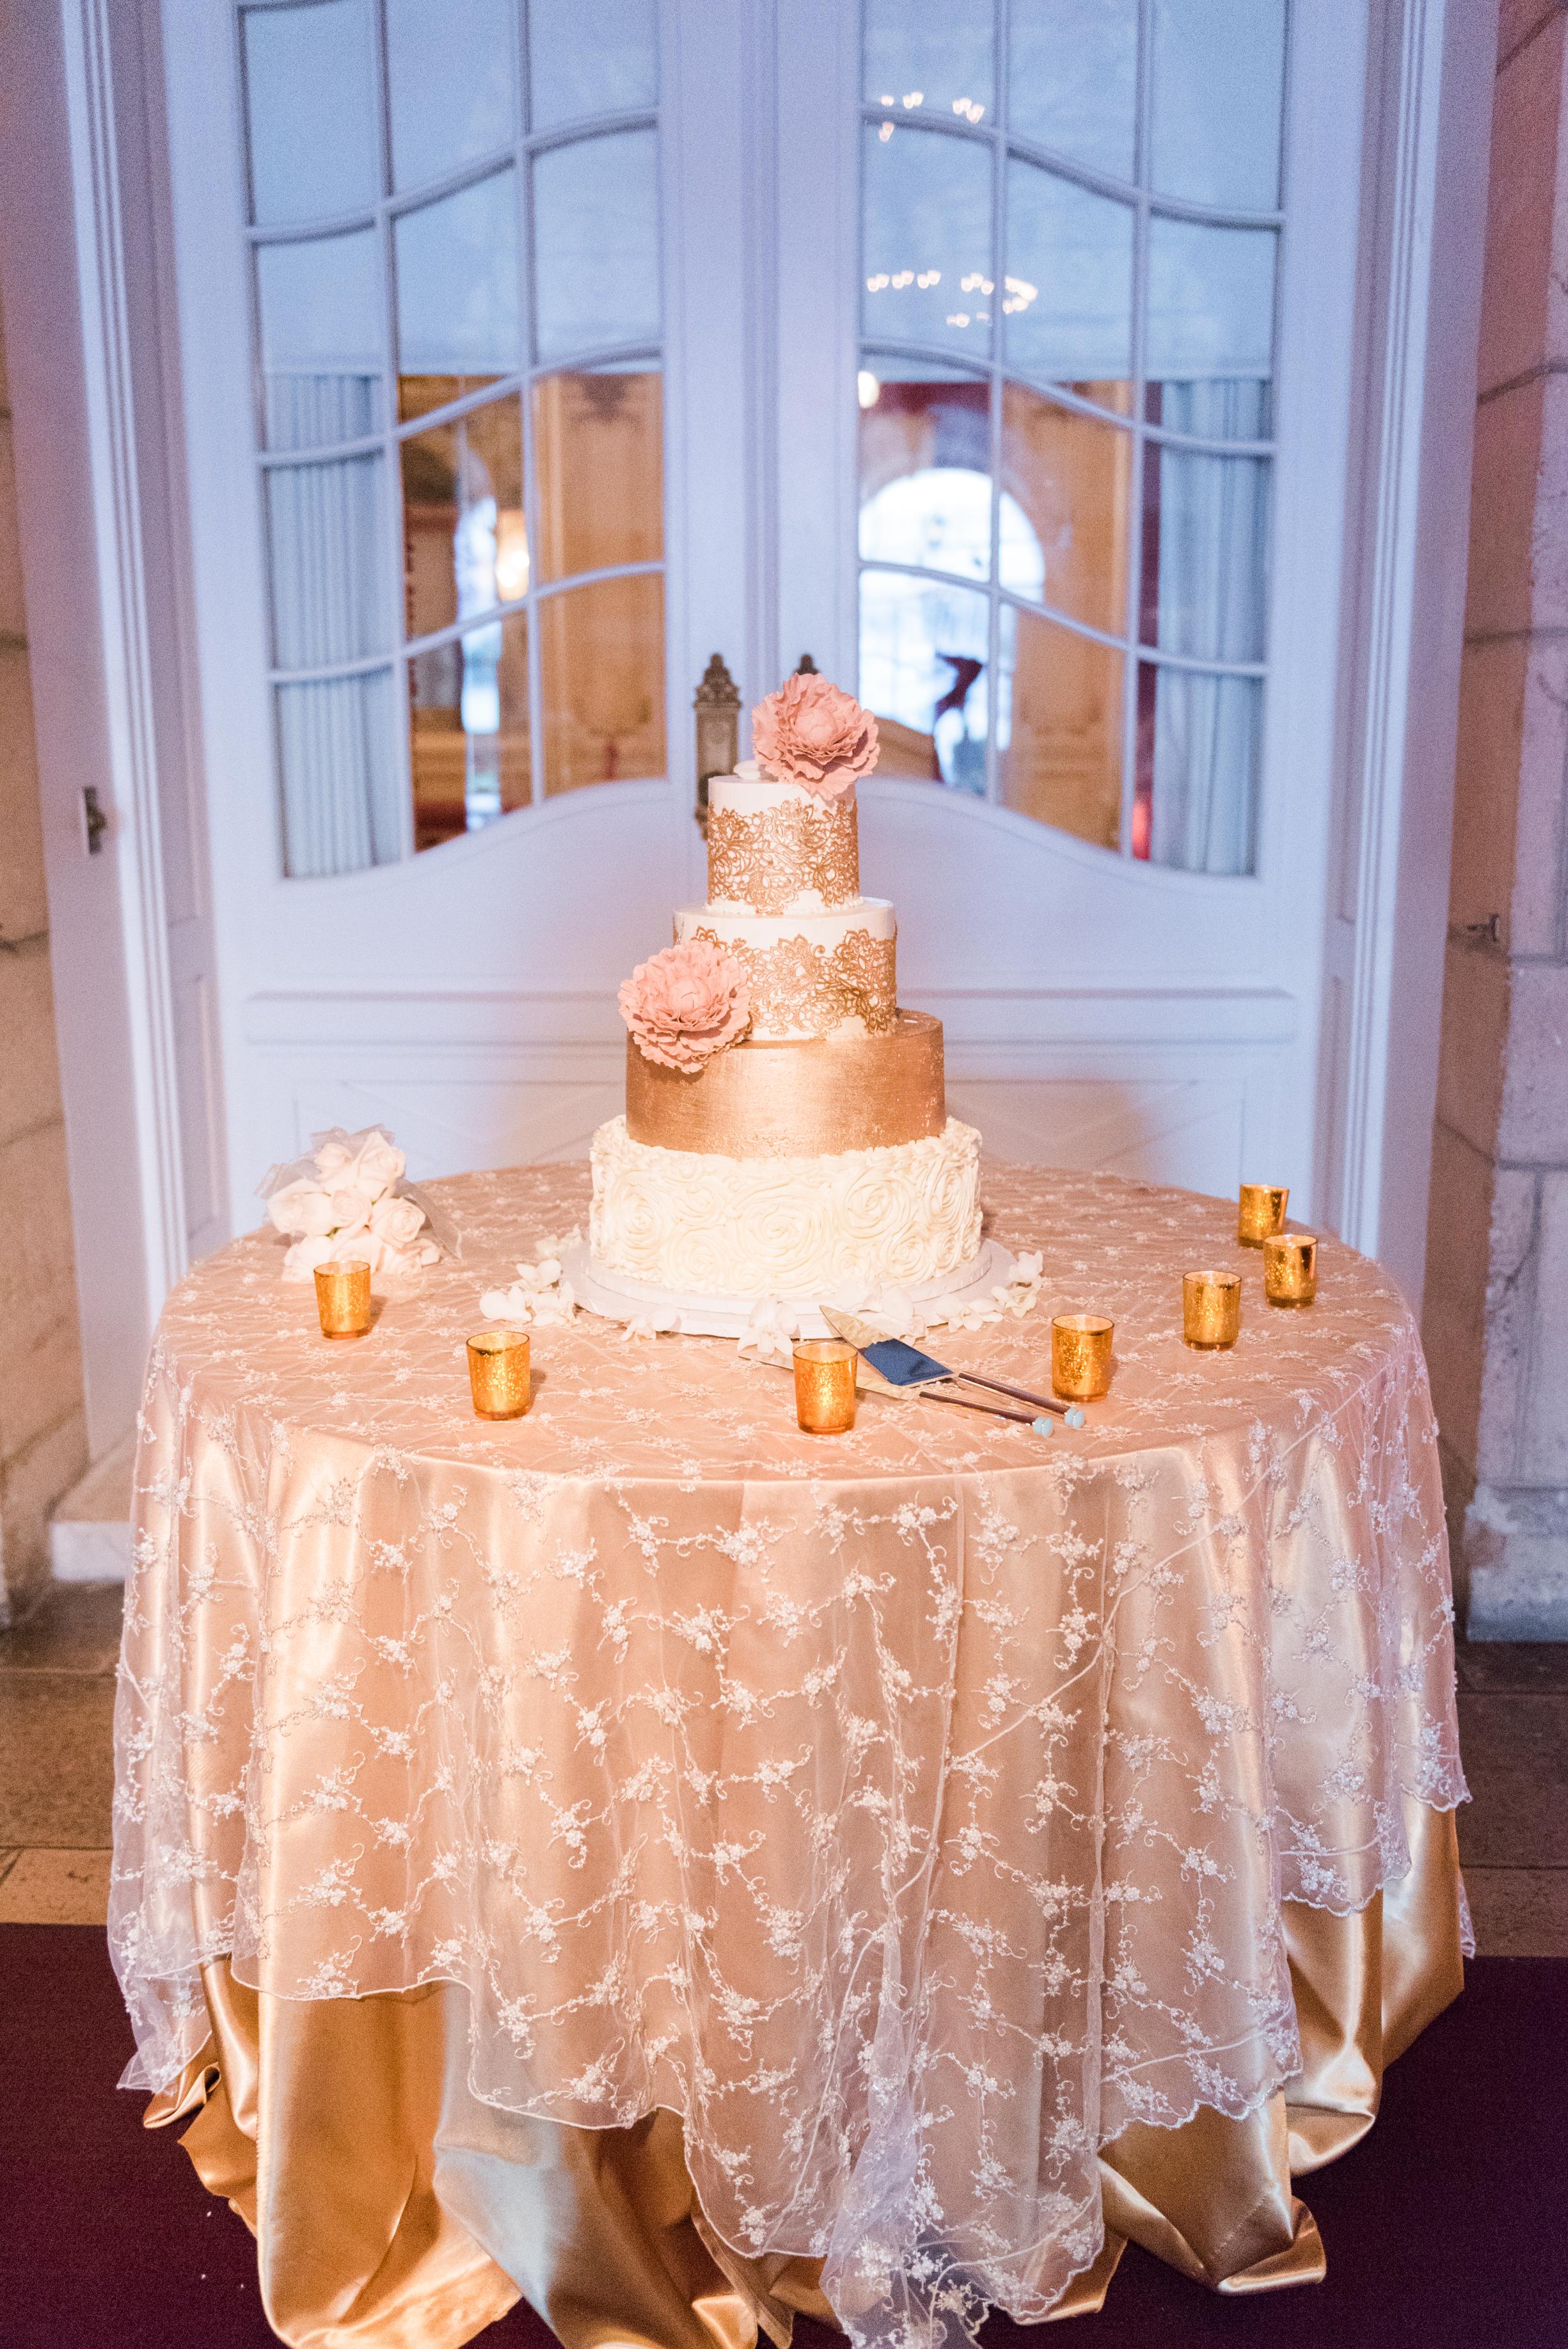 Gold and White Wedding Cake - Flagler Museum Palm Beach Wedding Ceremony - The Overwhelmed Bride Wedding Blog